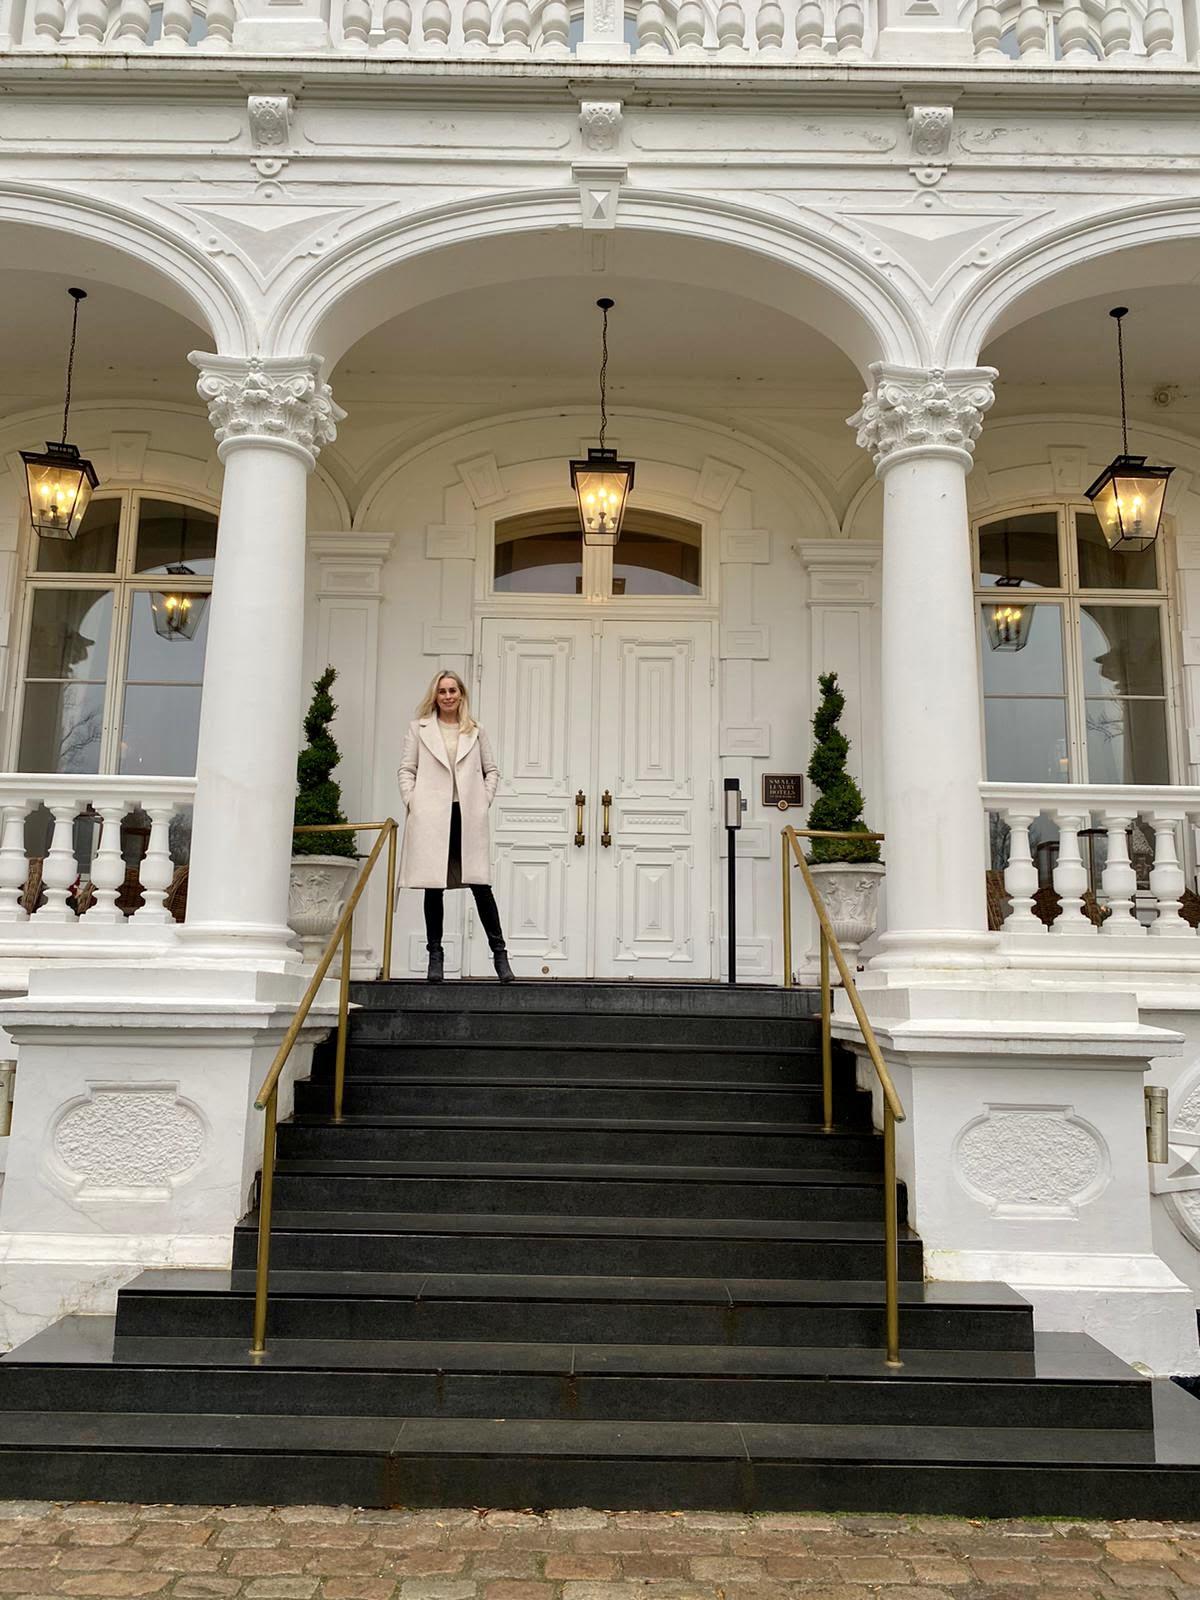 Kokkedal Slot Copenhagen, spa, ophold, hotel, luksus, gourmet, golf